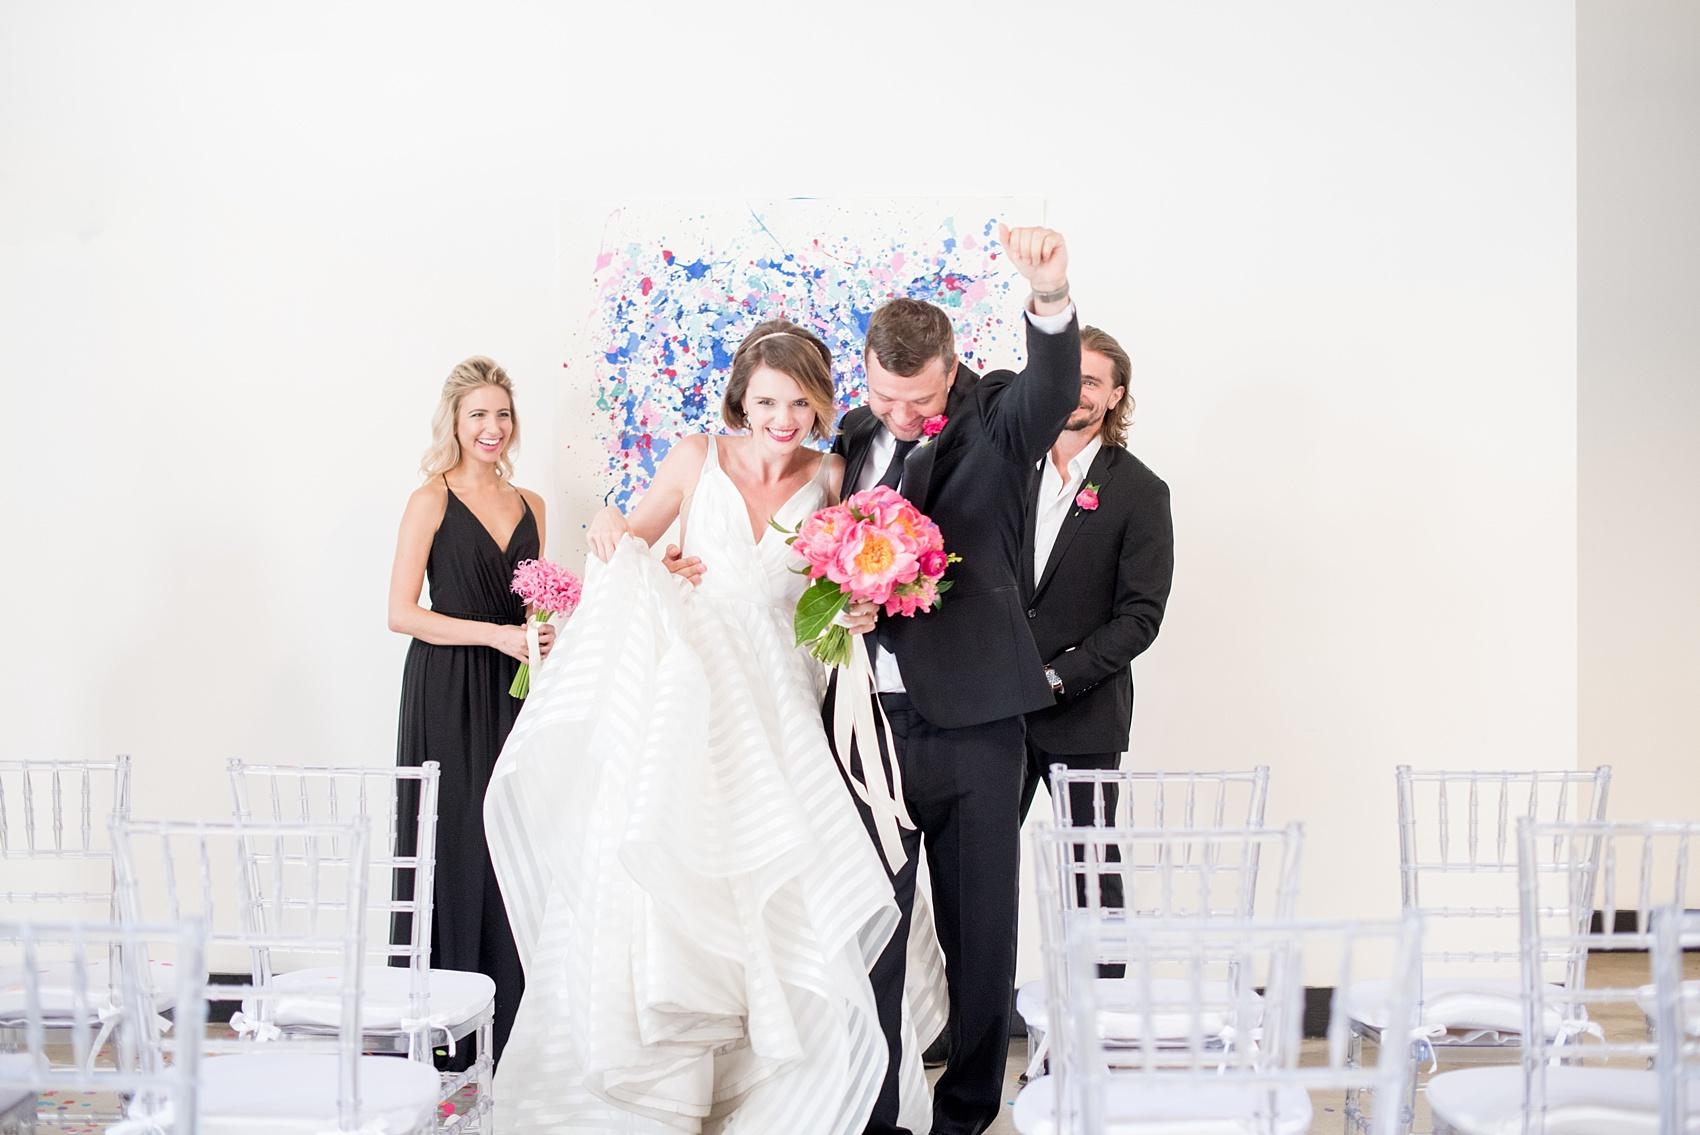 mikkelpaige-dobbin_st_brooklyn-wedding_photos-042